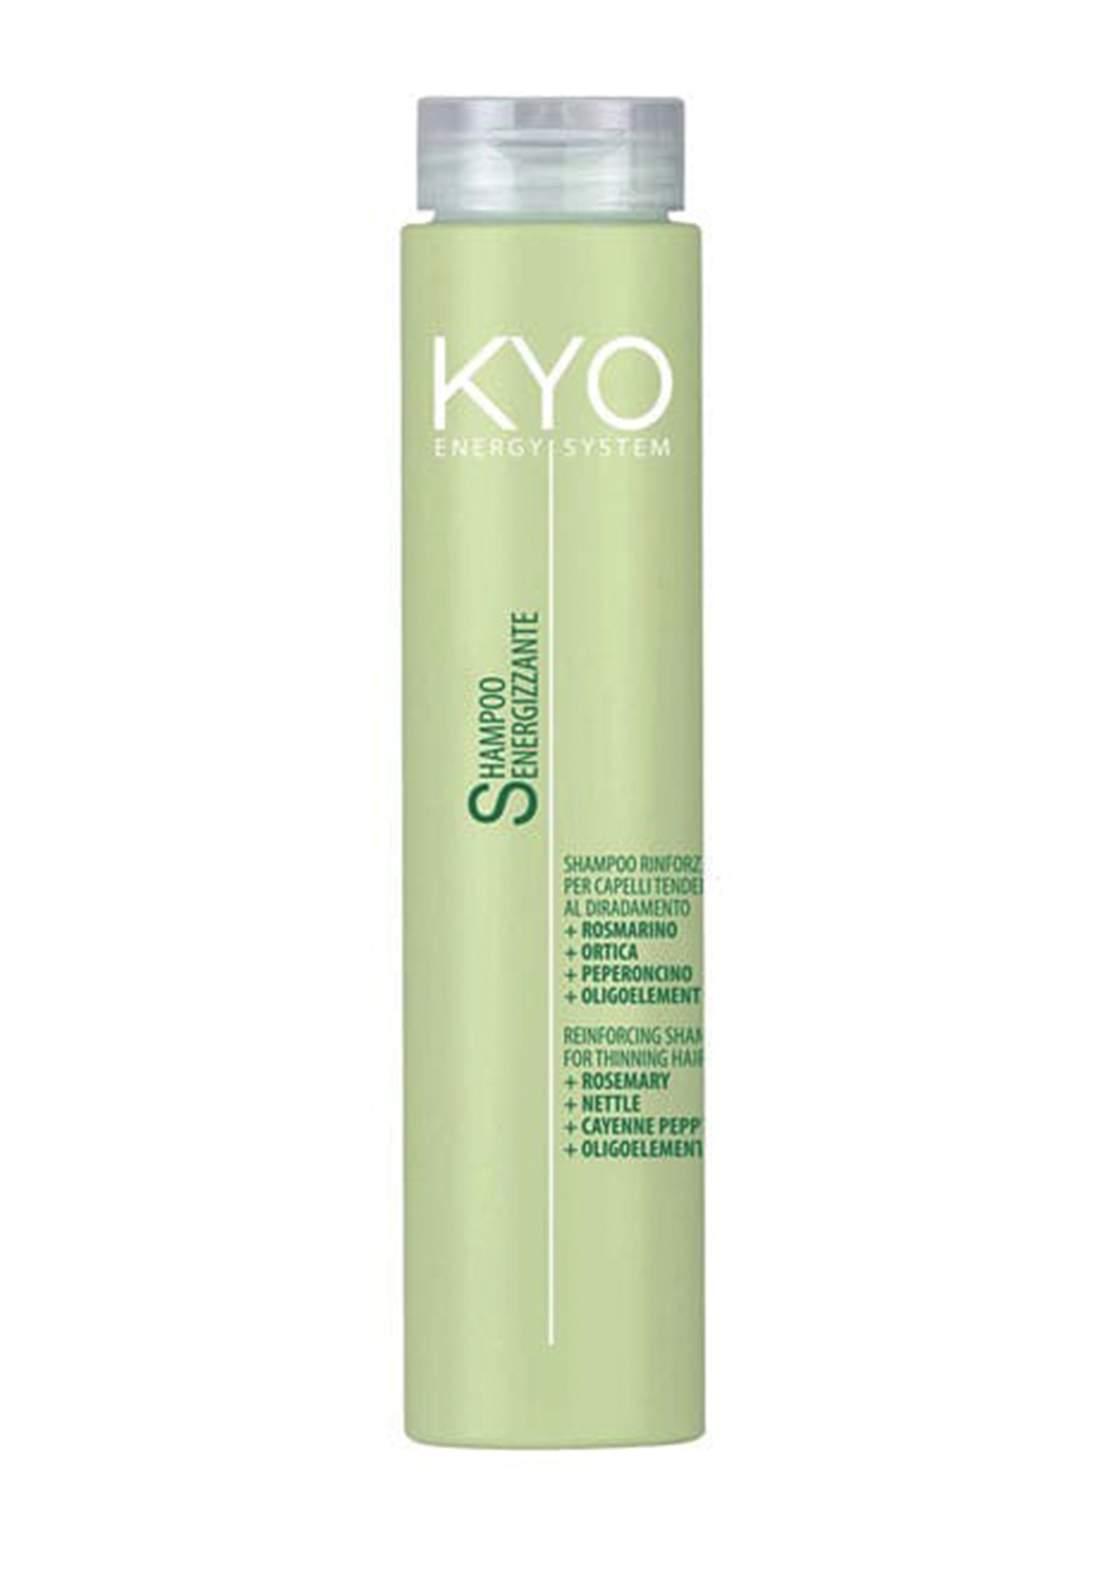 Kyo Energy System Shampoo 250ml شامبو شعر